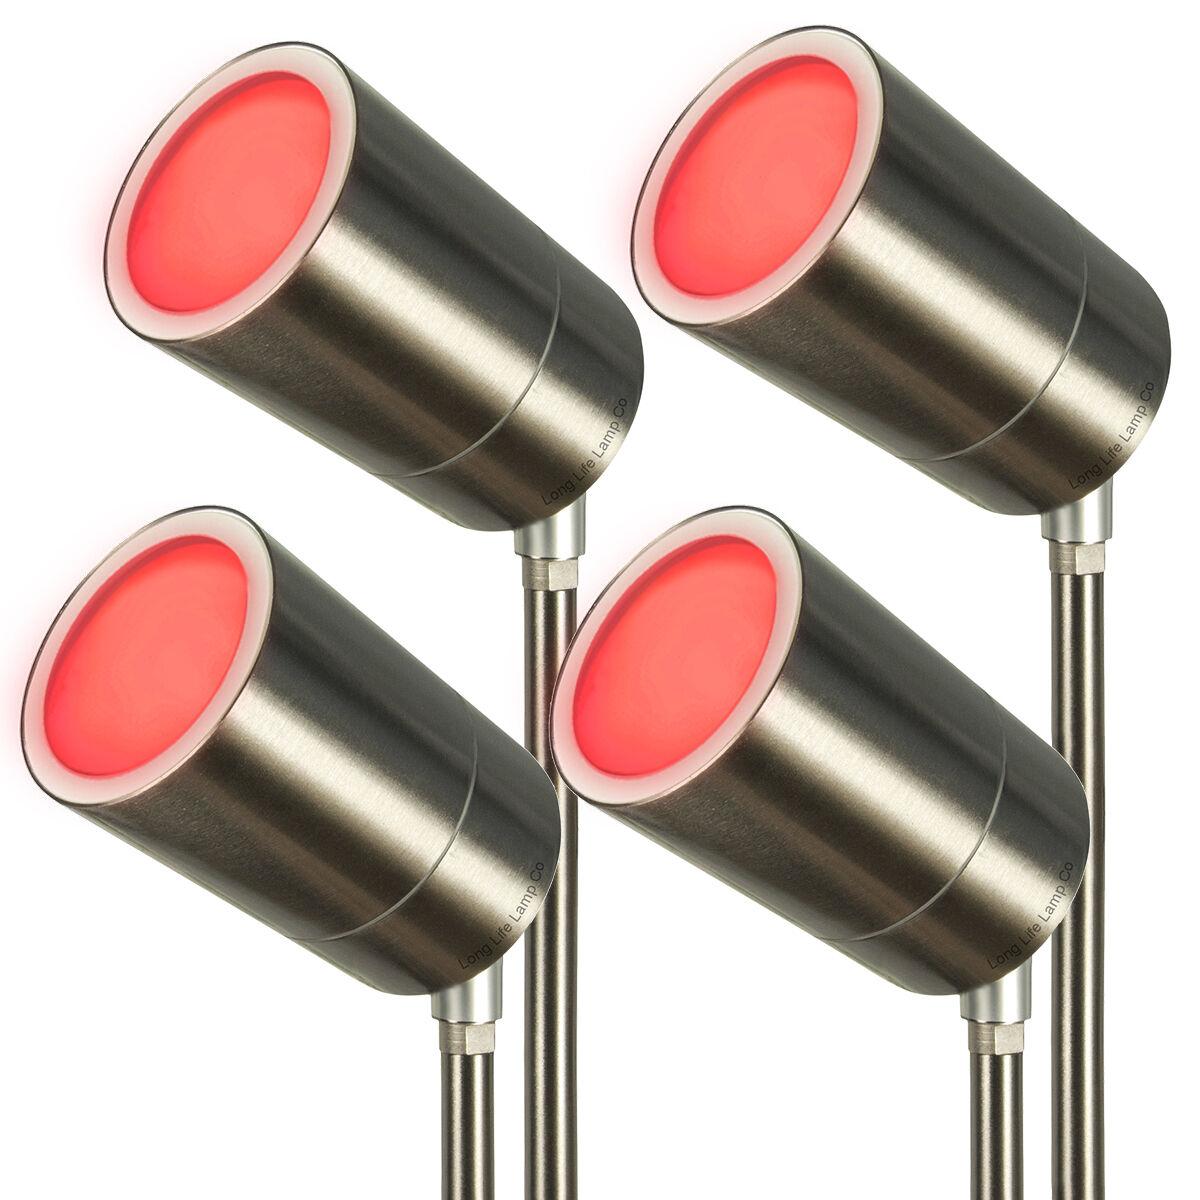 4 Pack Stainless Steel Outdoor Garden Garden Garden Ground Spike Light Adjustable ZLC0201 000fd1